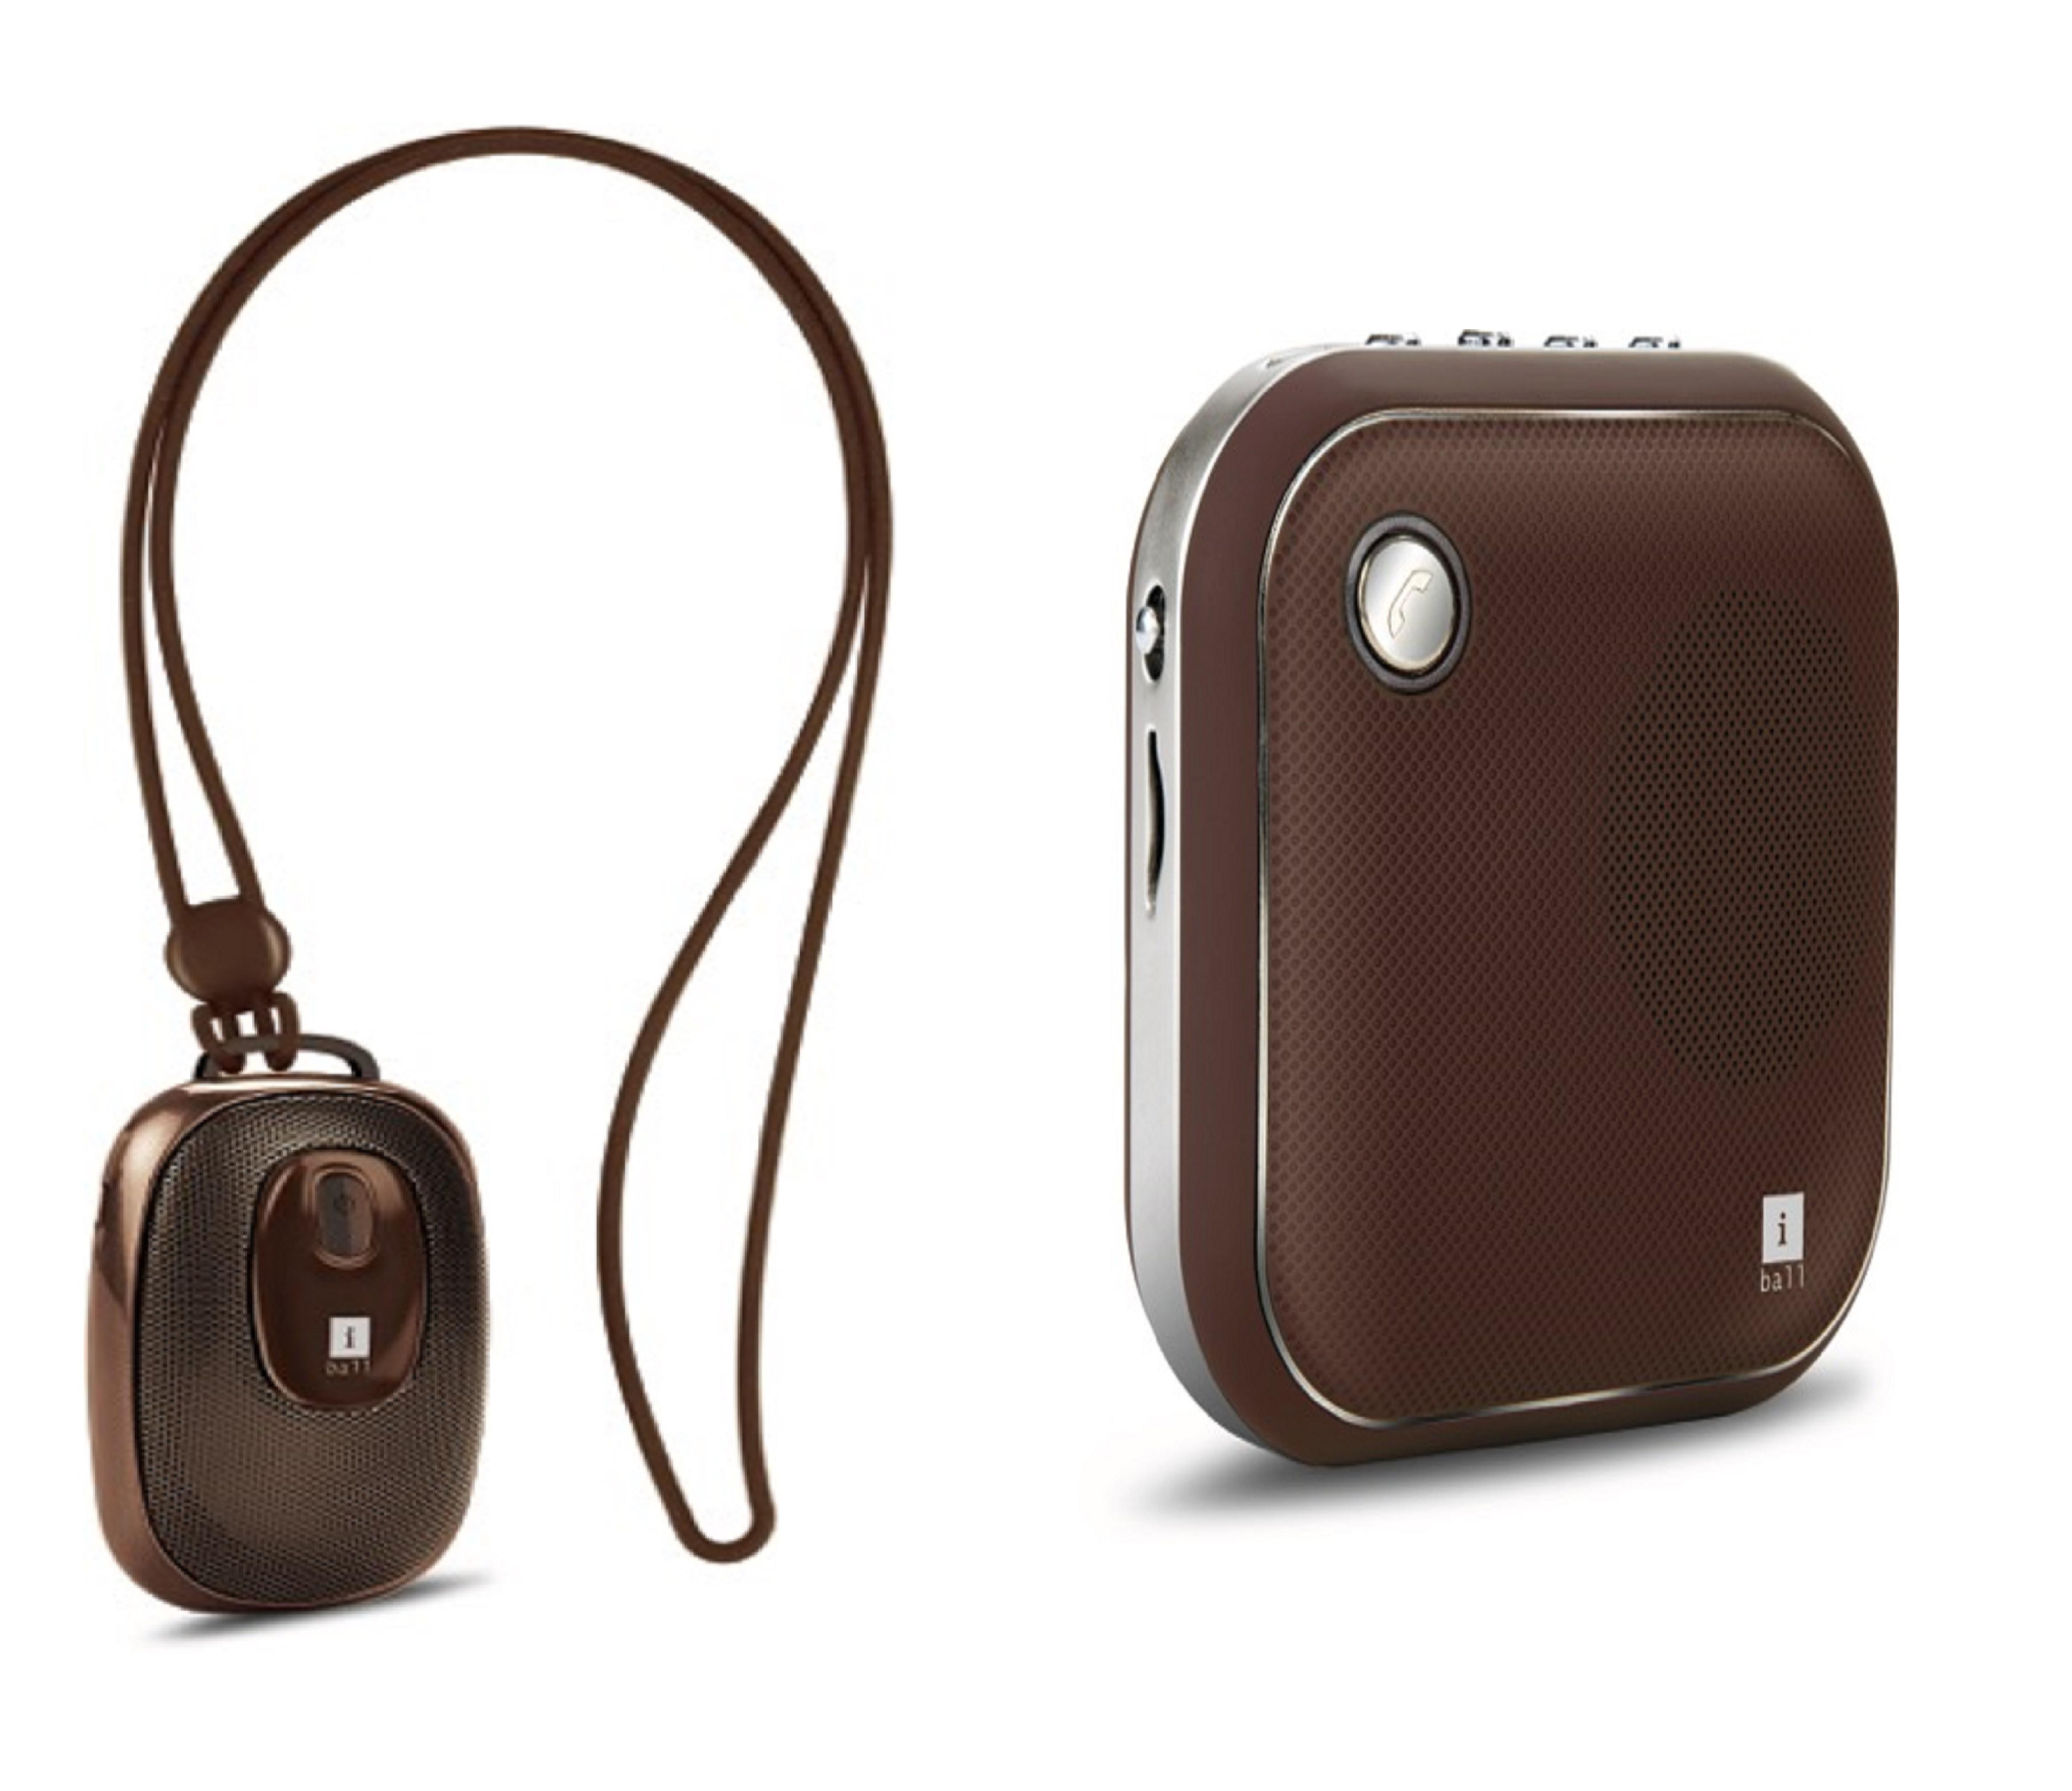 Iball Bluetooth Portable Speaker: Online IT Magazine India » IBall Launches Two Portable Bluetooth Speakers IBall Musi